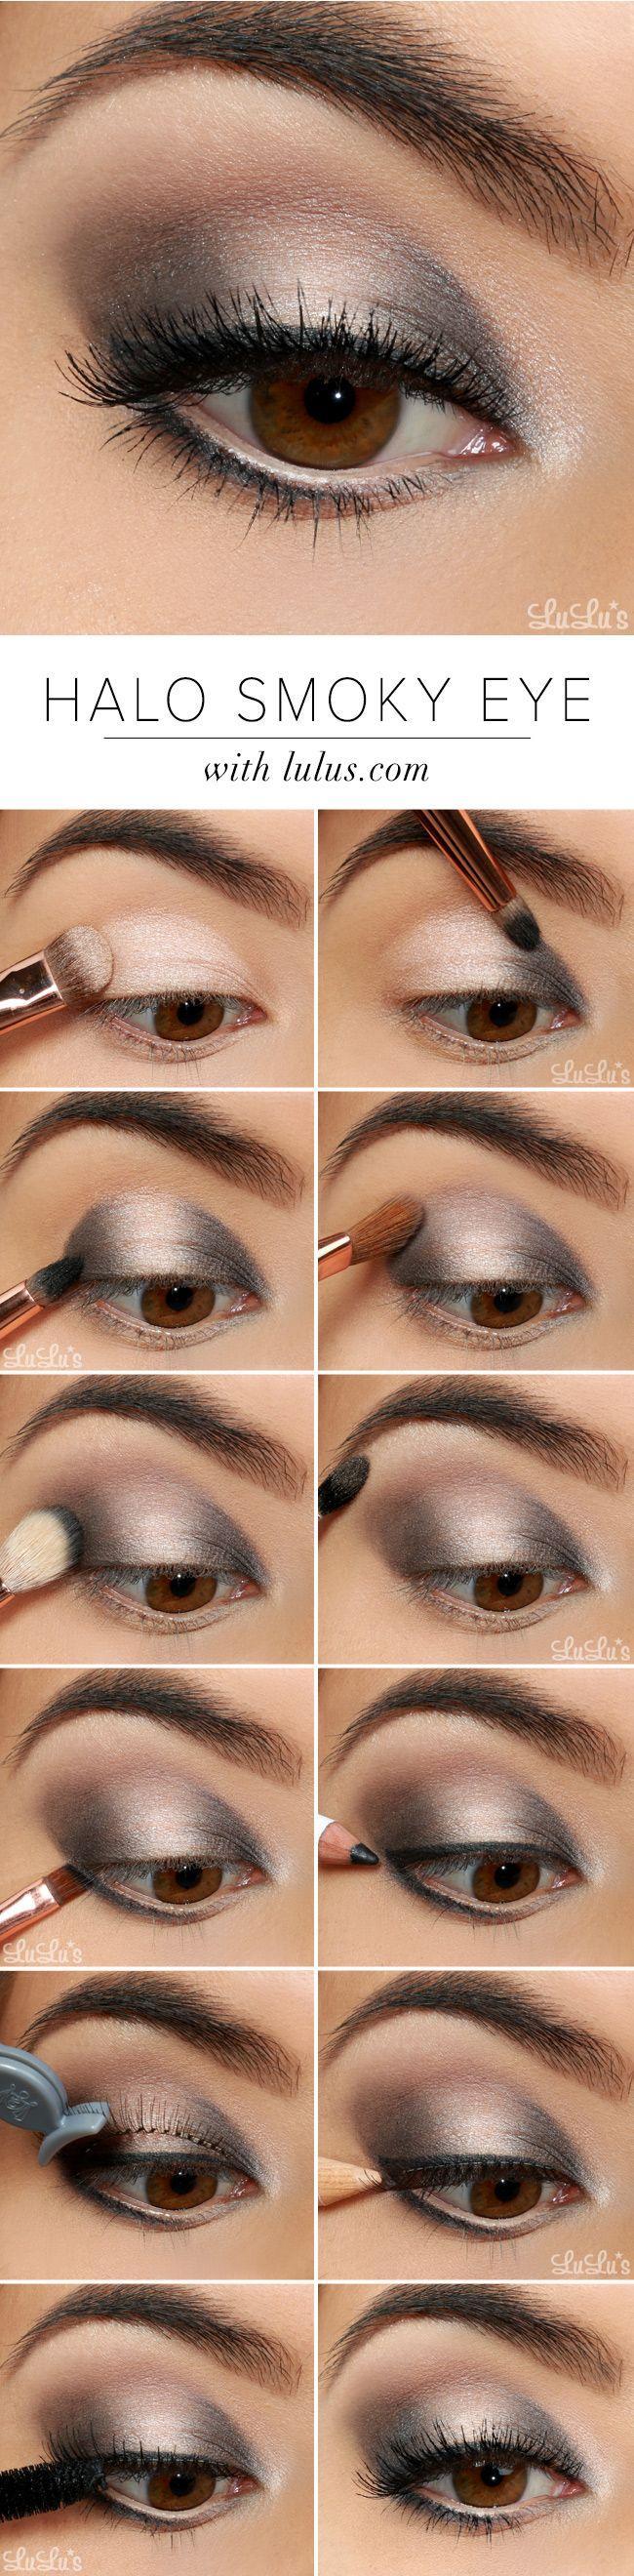 Свадьба - Lulus How-To: Halo Smokey Eye Shadow Tutorial